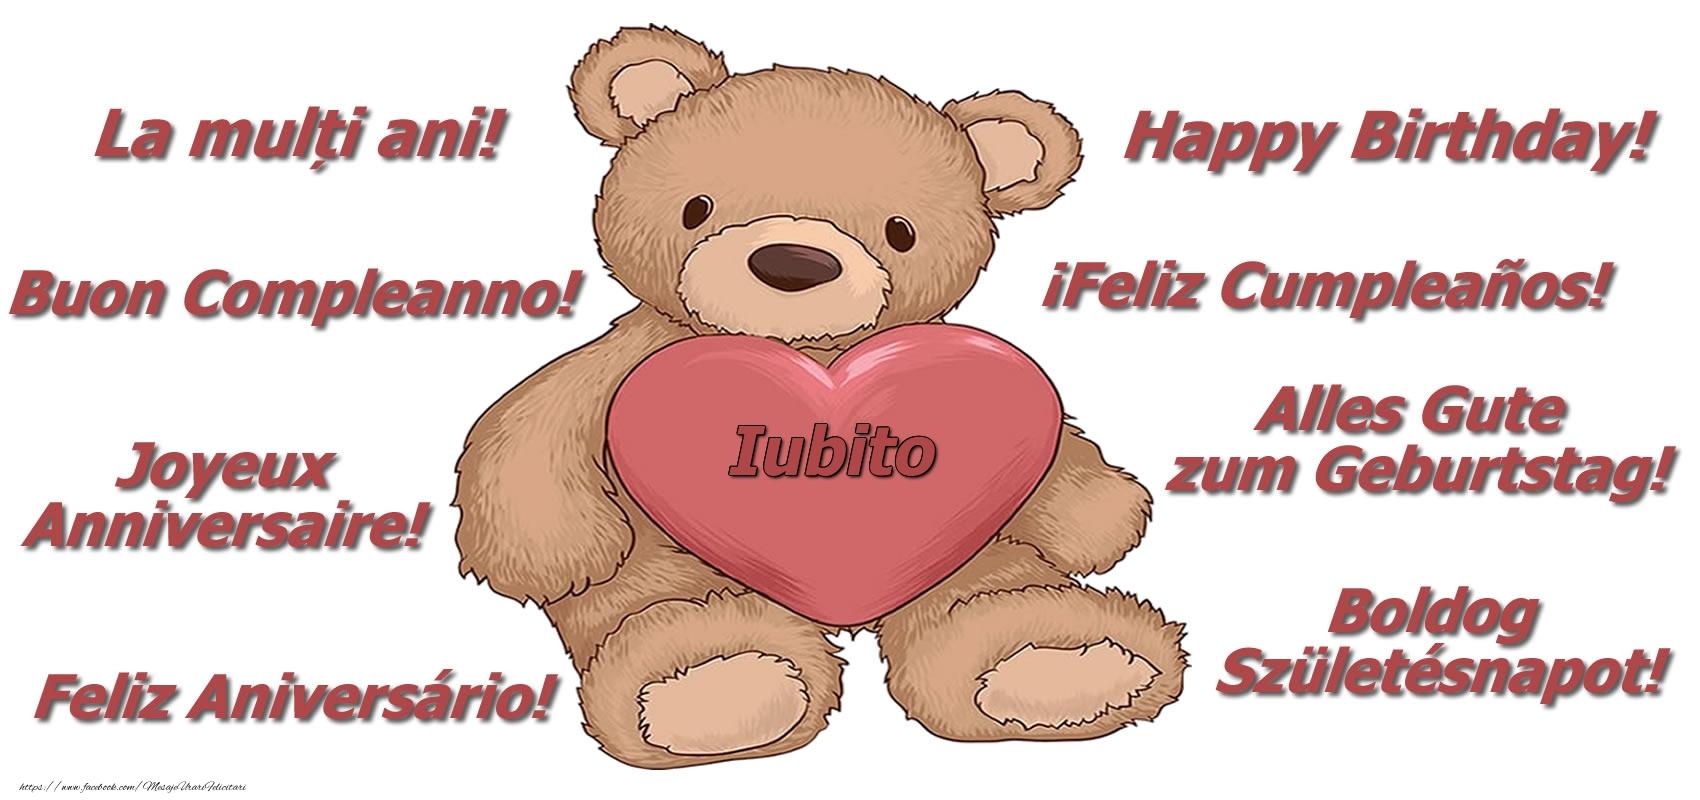 Felicitari de zi de nastere pentru Iubita - La multi ani iubito! - Ursulet